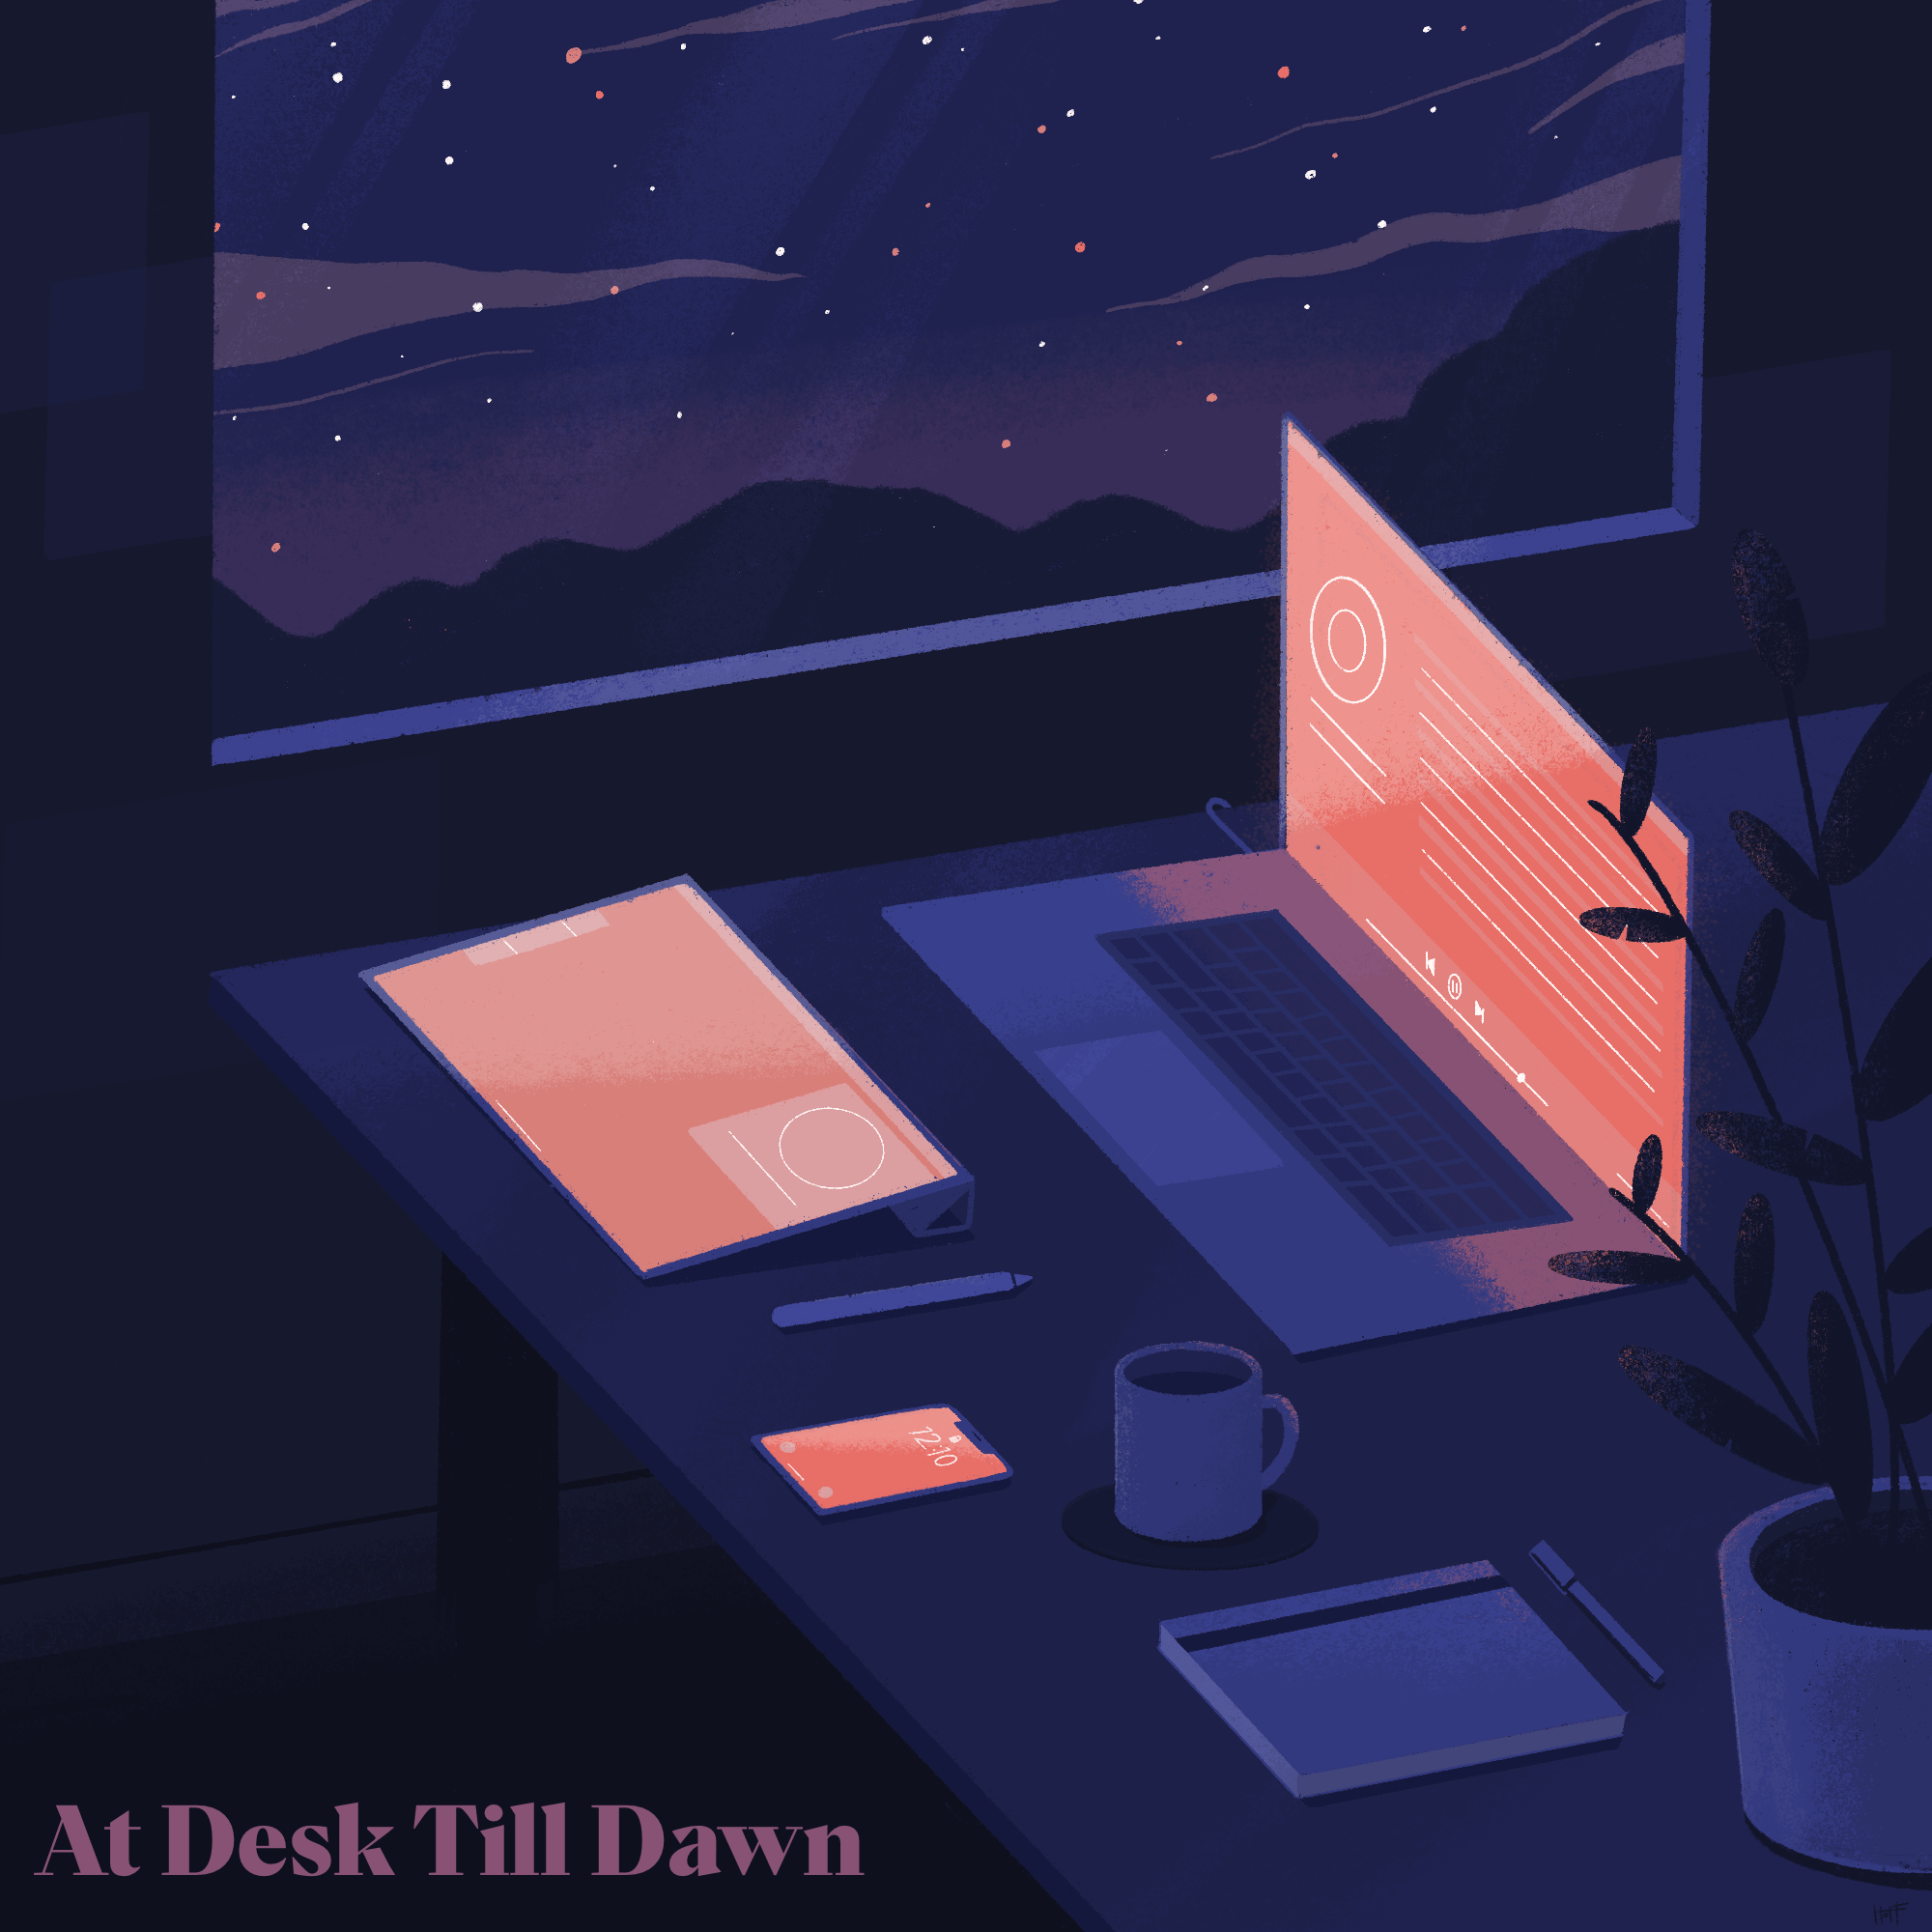 At_Desk_Till_Dawn_small